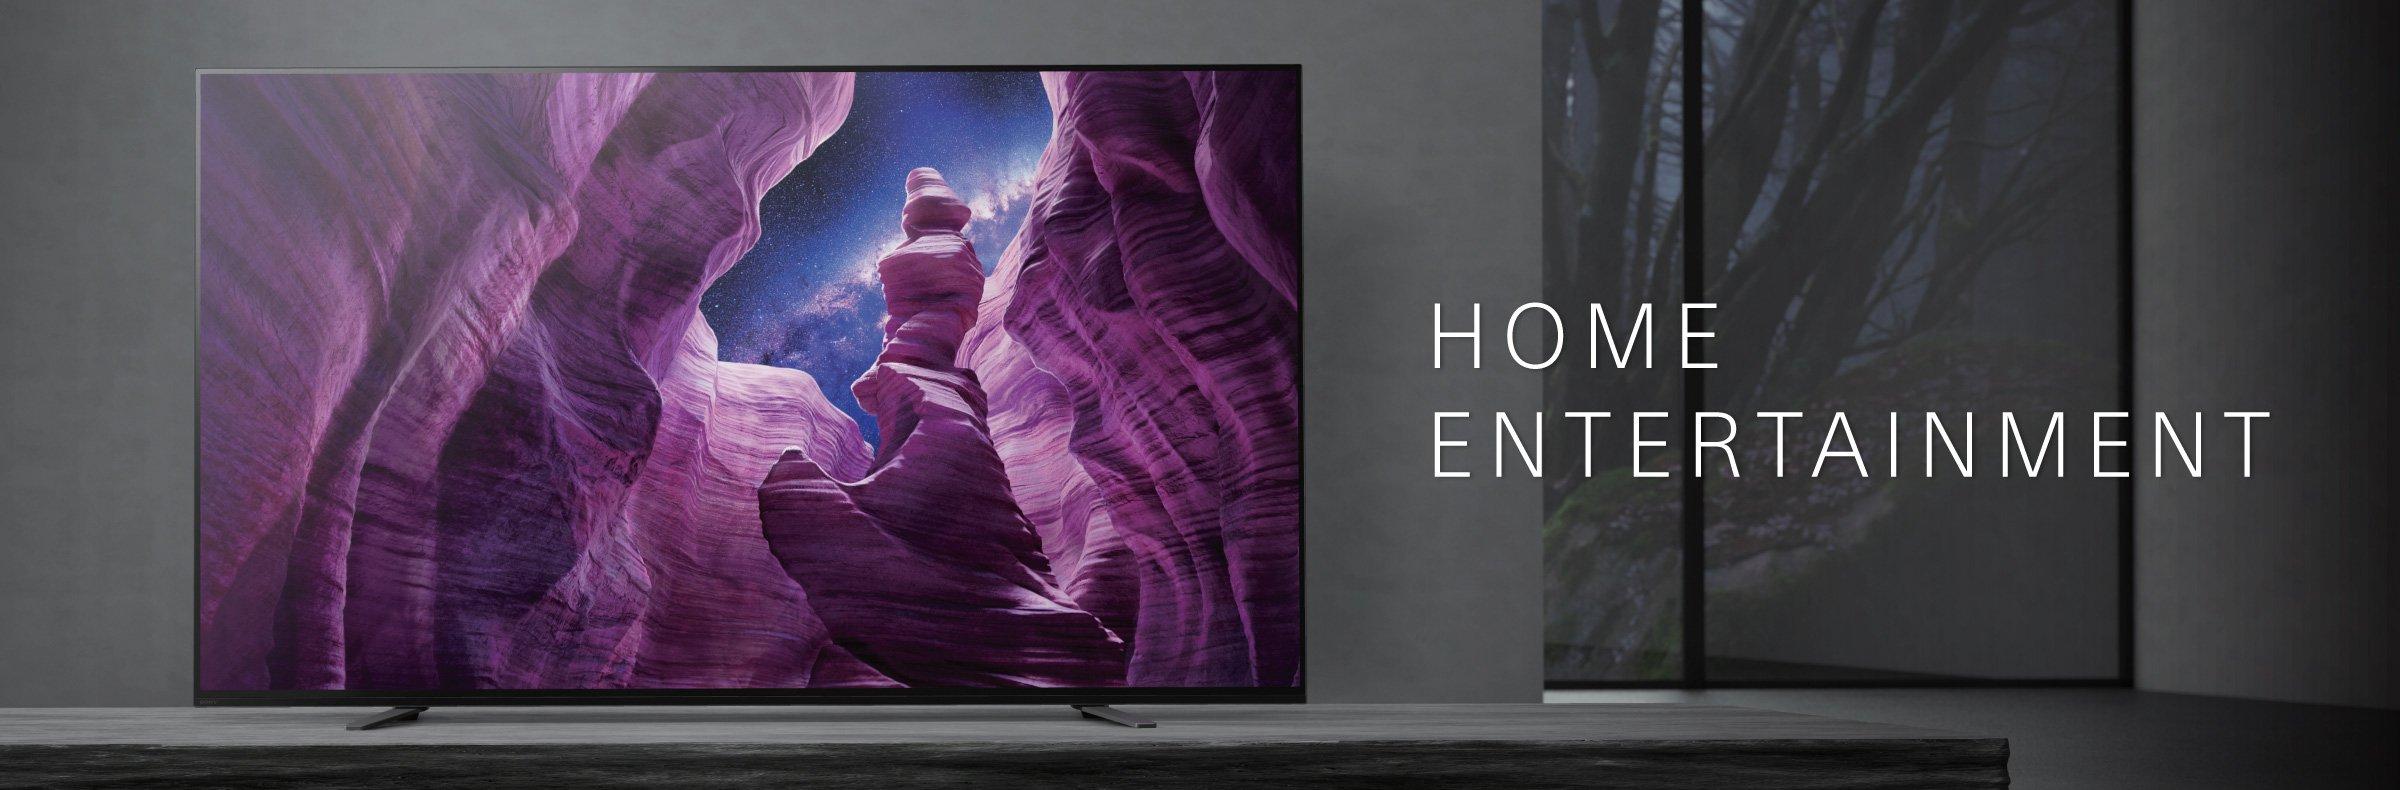 Sony - Home Entertainment